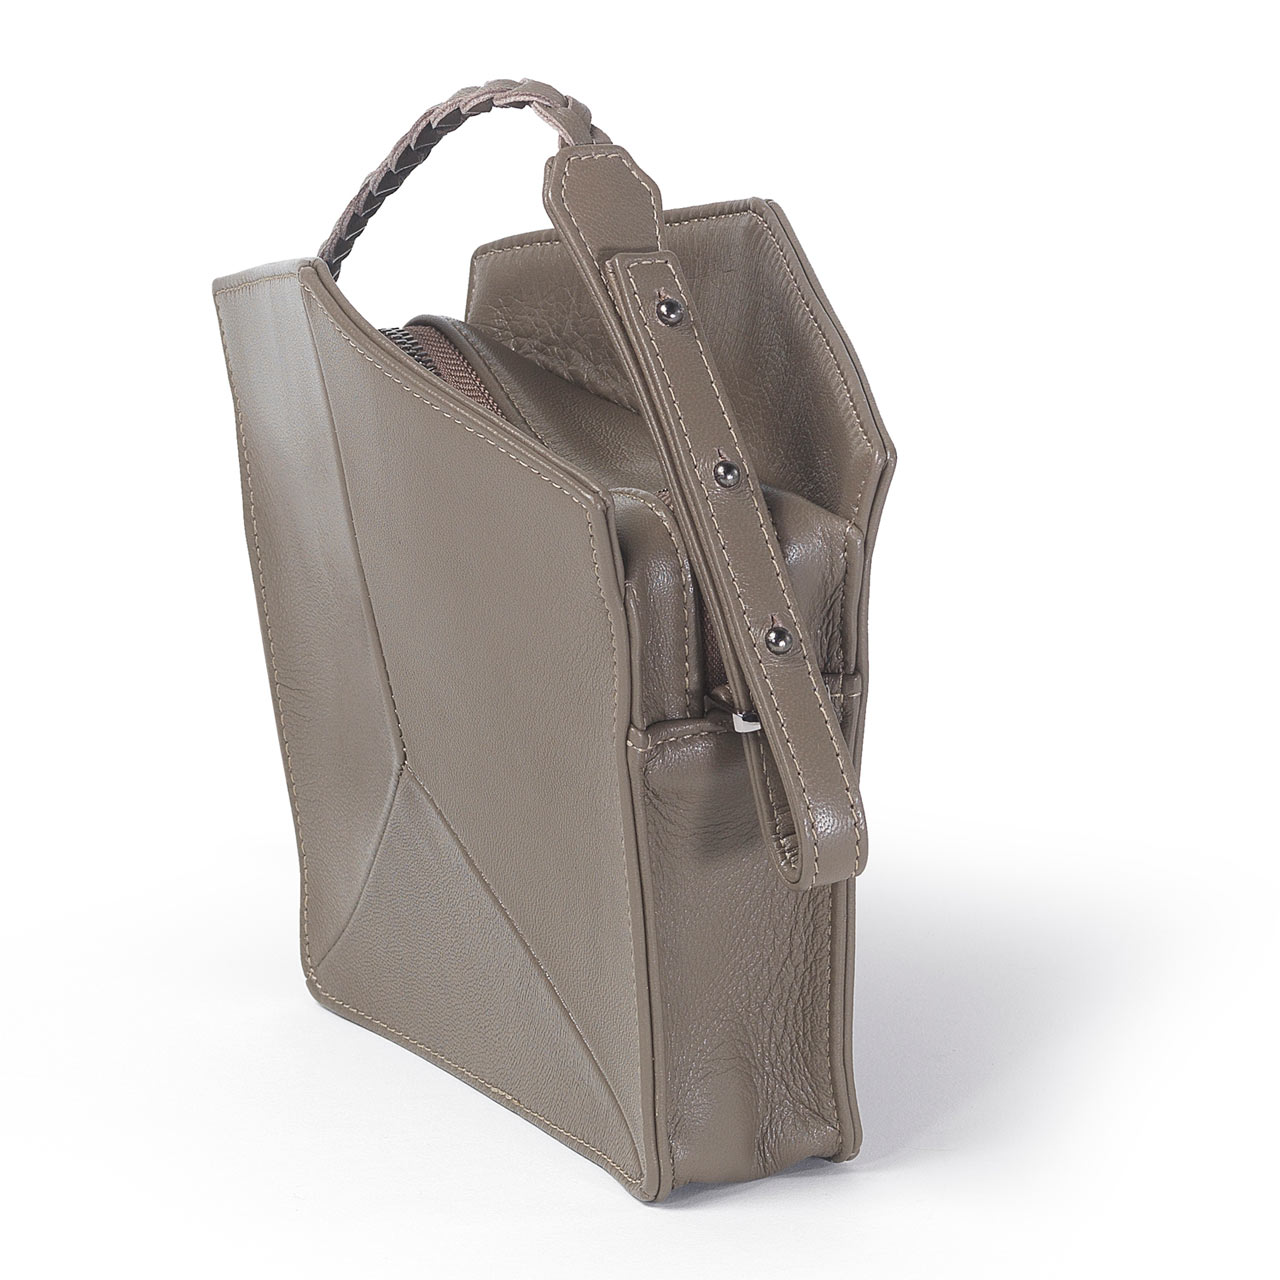 Imago-A-Prism-Bags-9-Mini-Bag-Sable-Grey